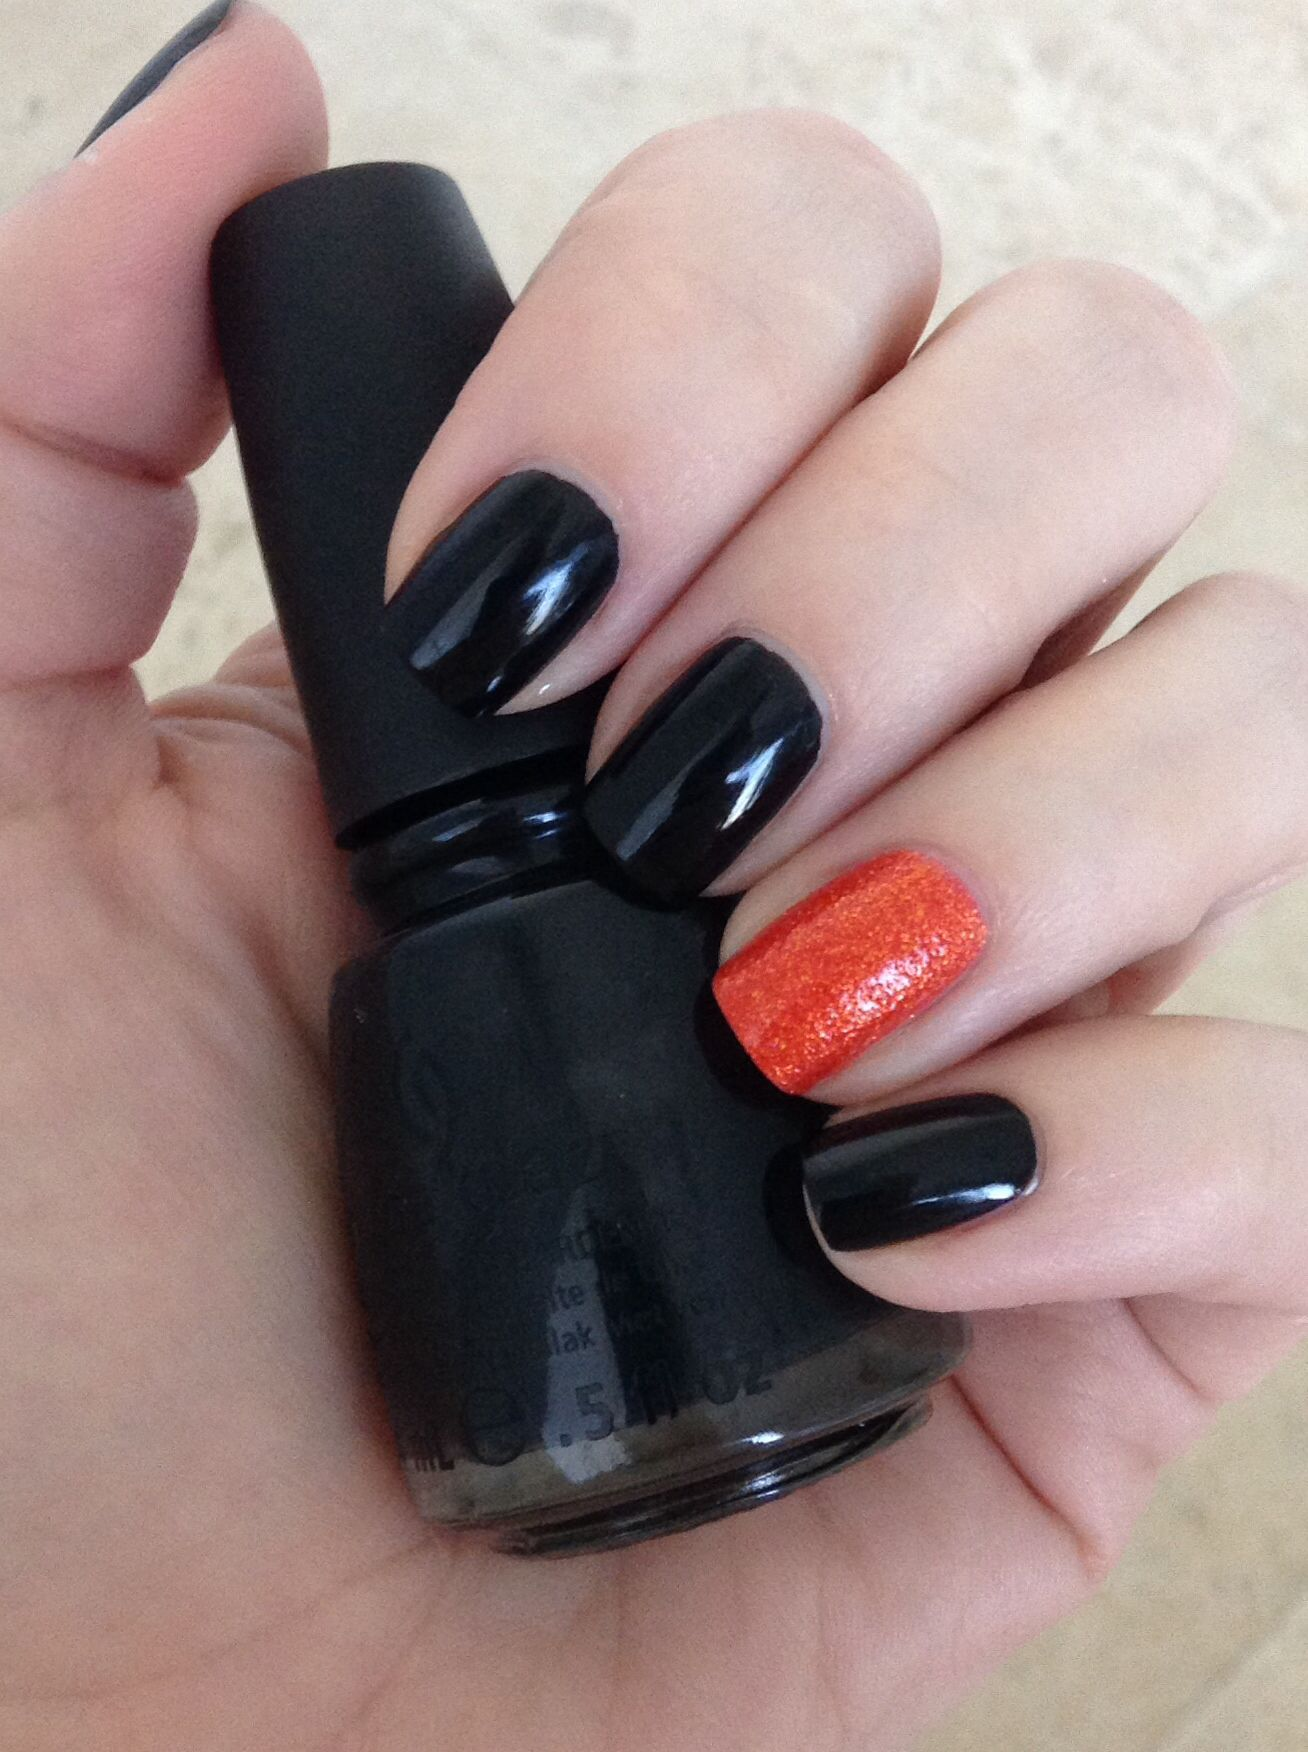 Nails • Halloween bling Nails, Pedicure designs